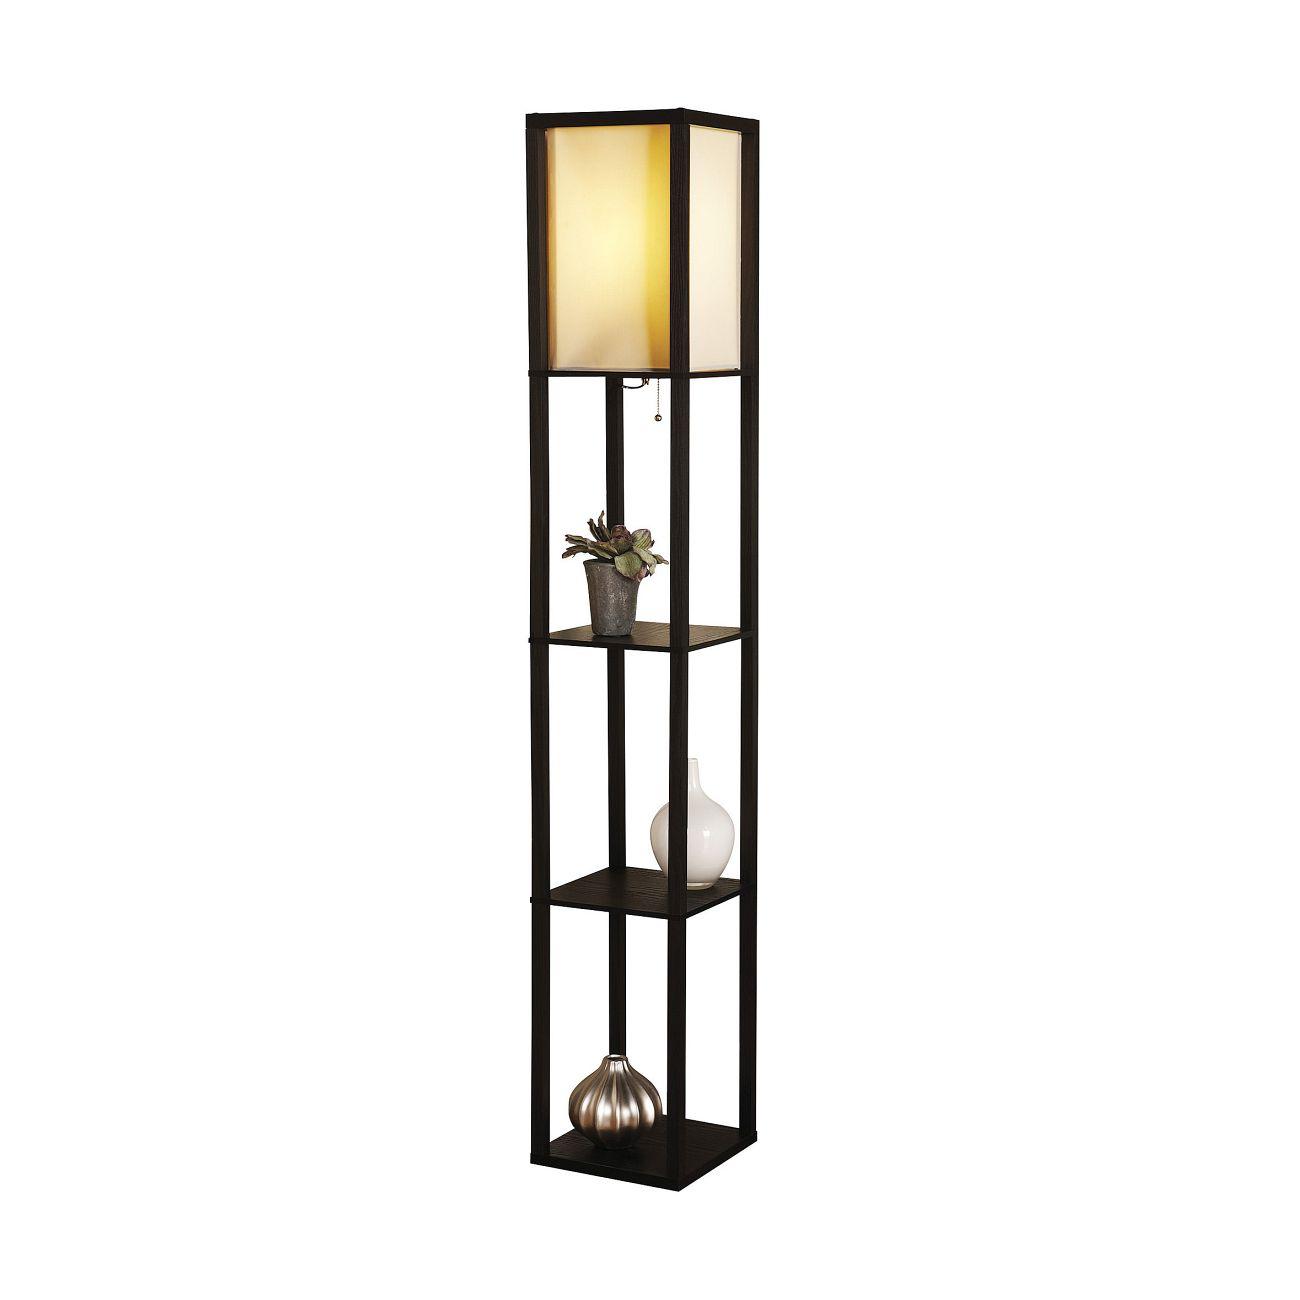 adesso contempory 3 shelf floor lamp dark finish ebay. Black Bedroom Furniture Sets. Home Design Ideas